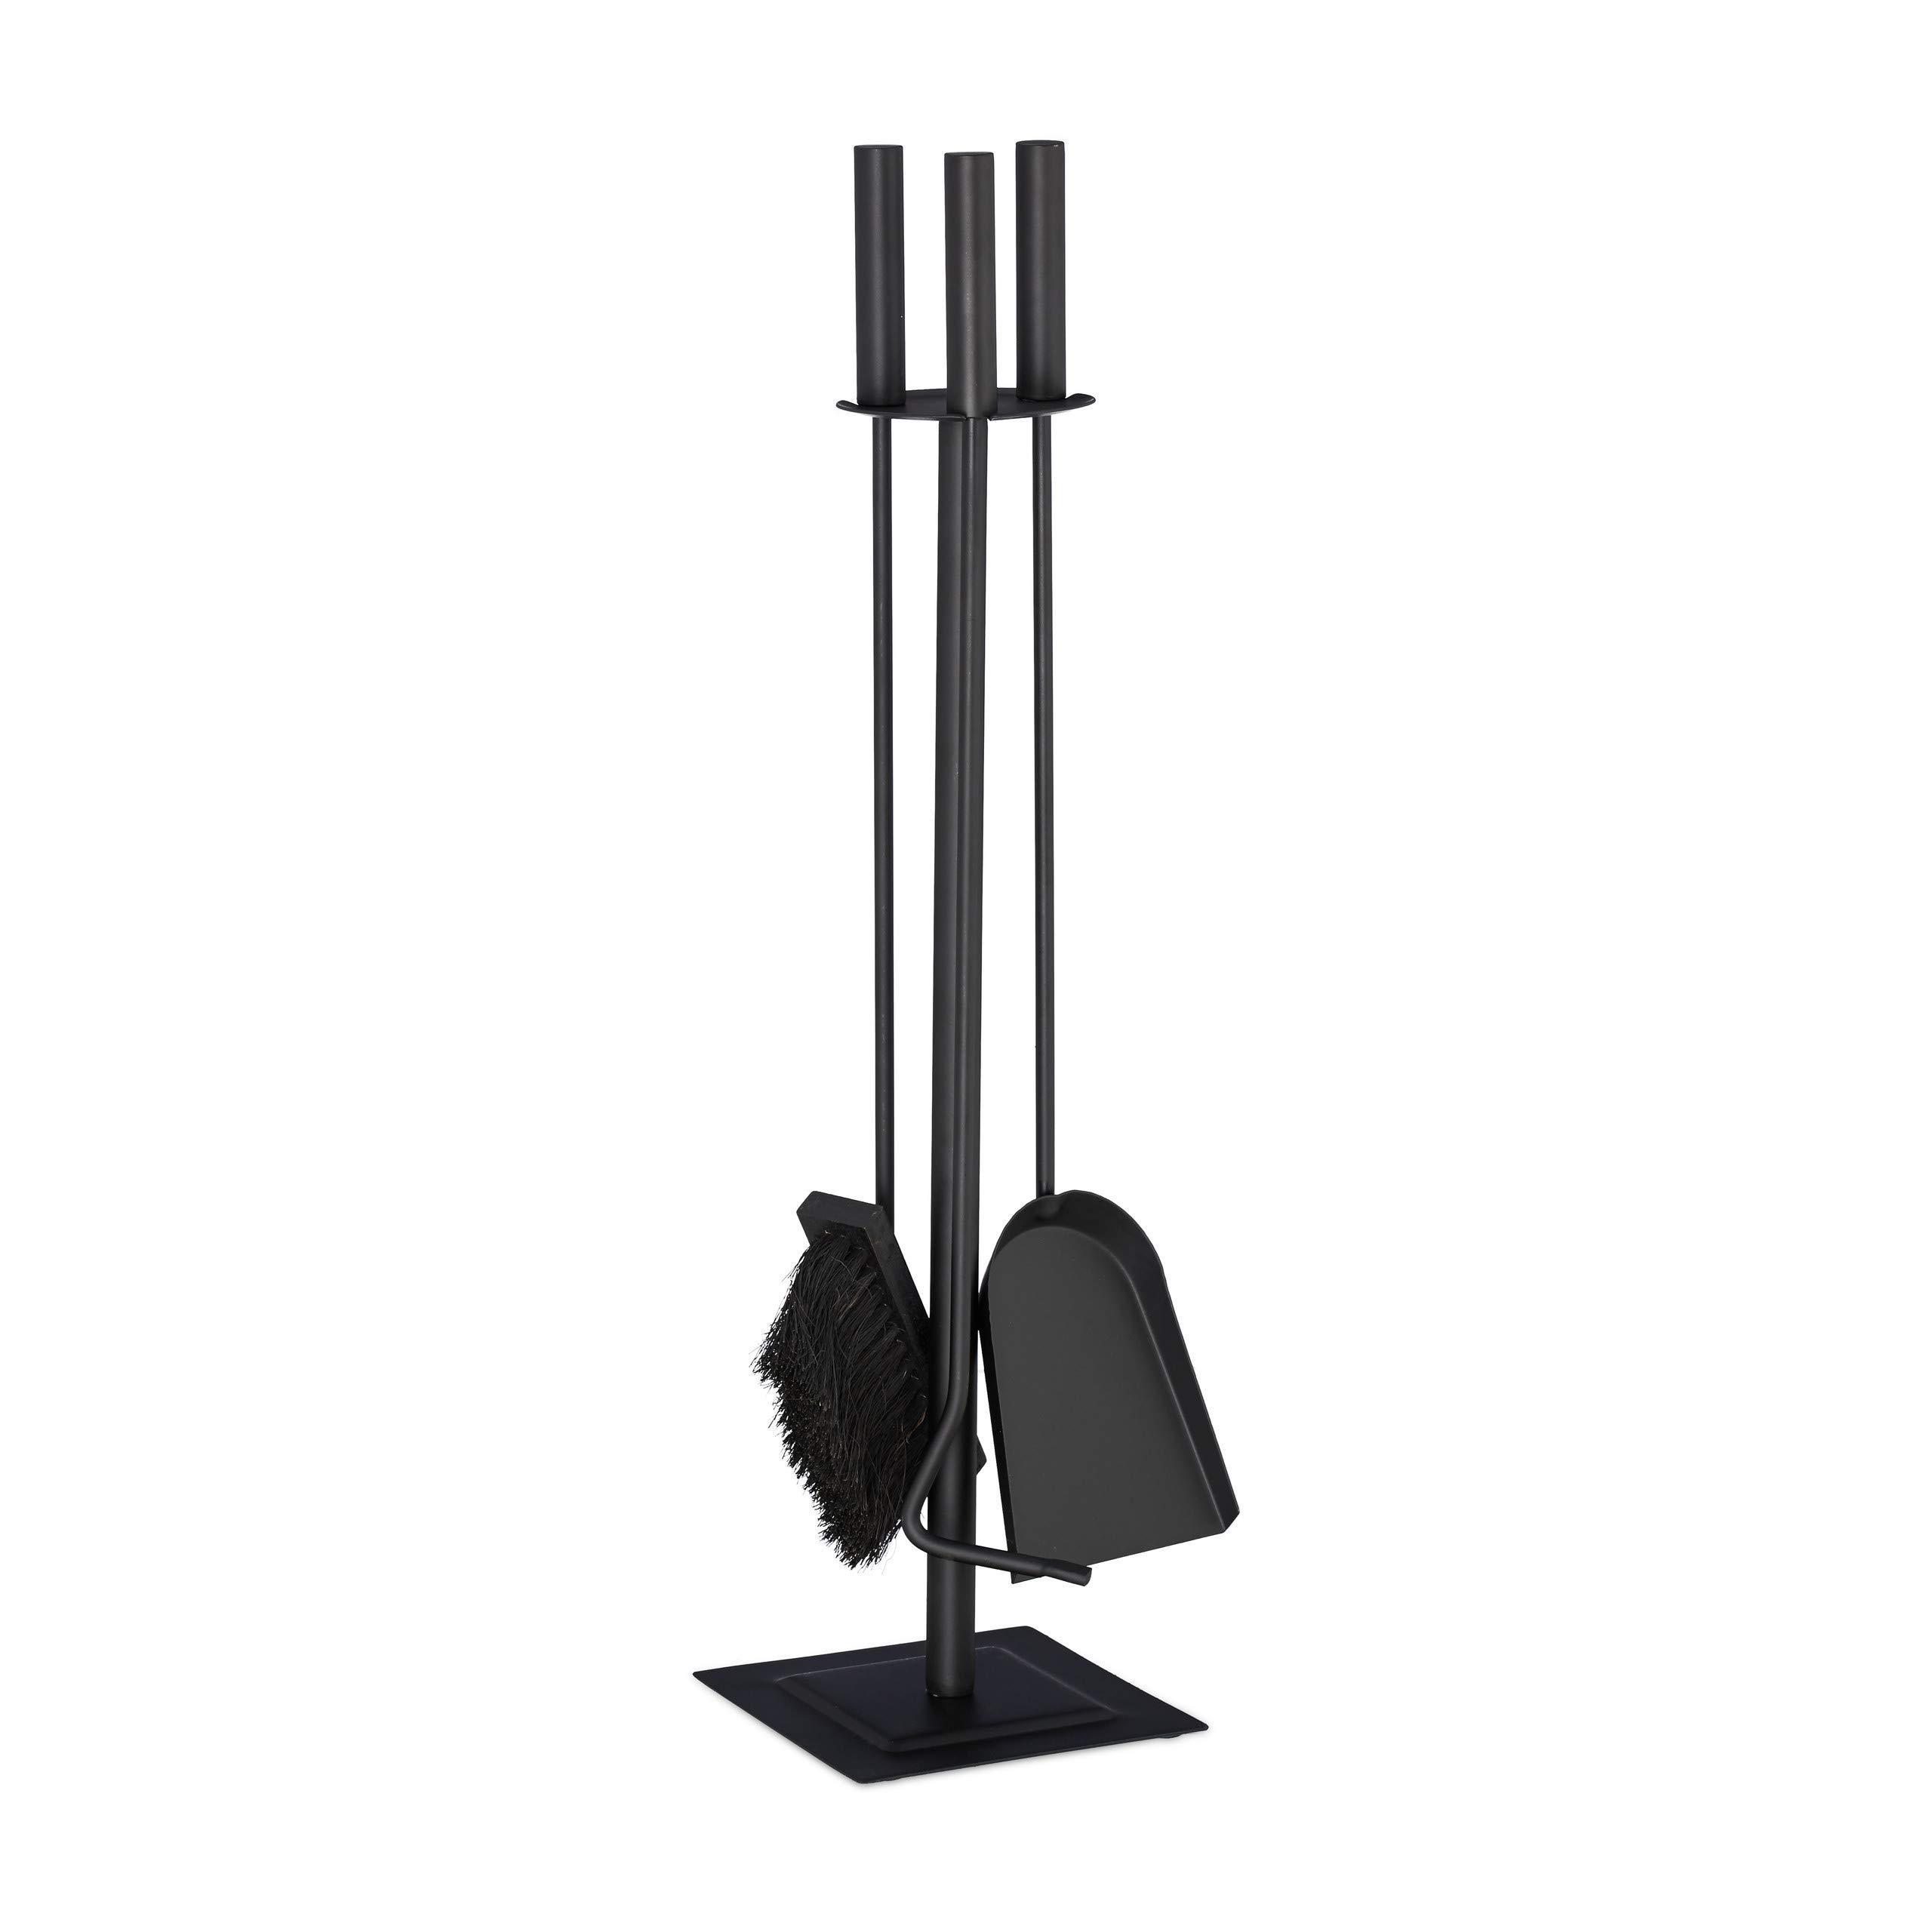 Relaxdays 4-Piece Fireplace Companion Tool Set Shovel, Brush, Poker & Holder, Modern Design, Black, 61 x 15 x 15 cm